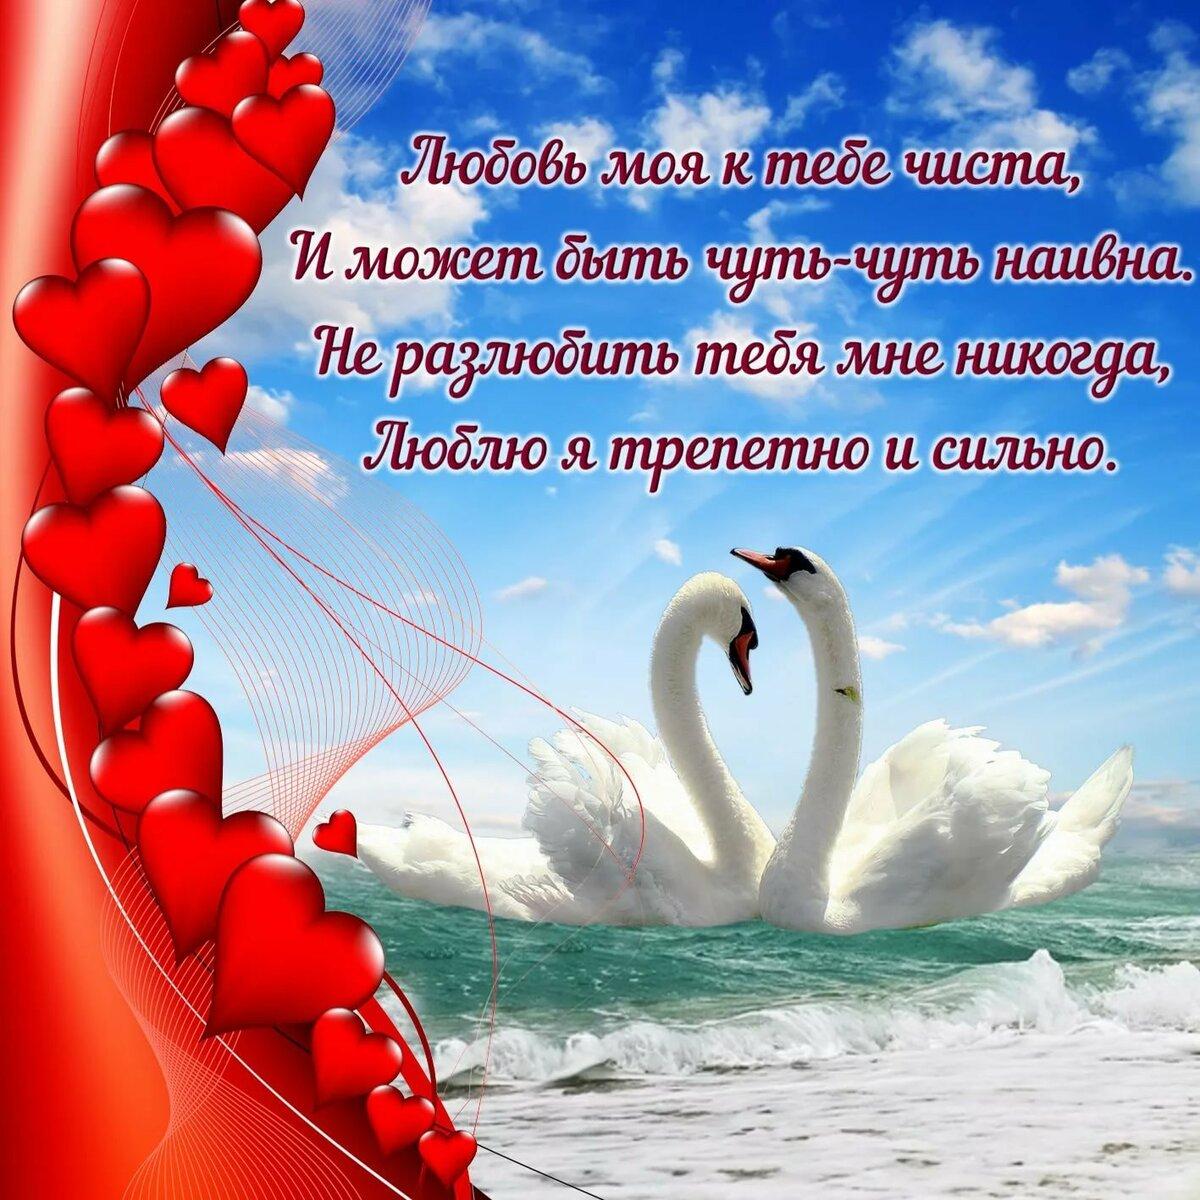 сайт открытки любимому оригинал